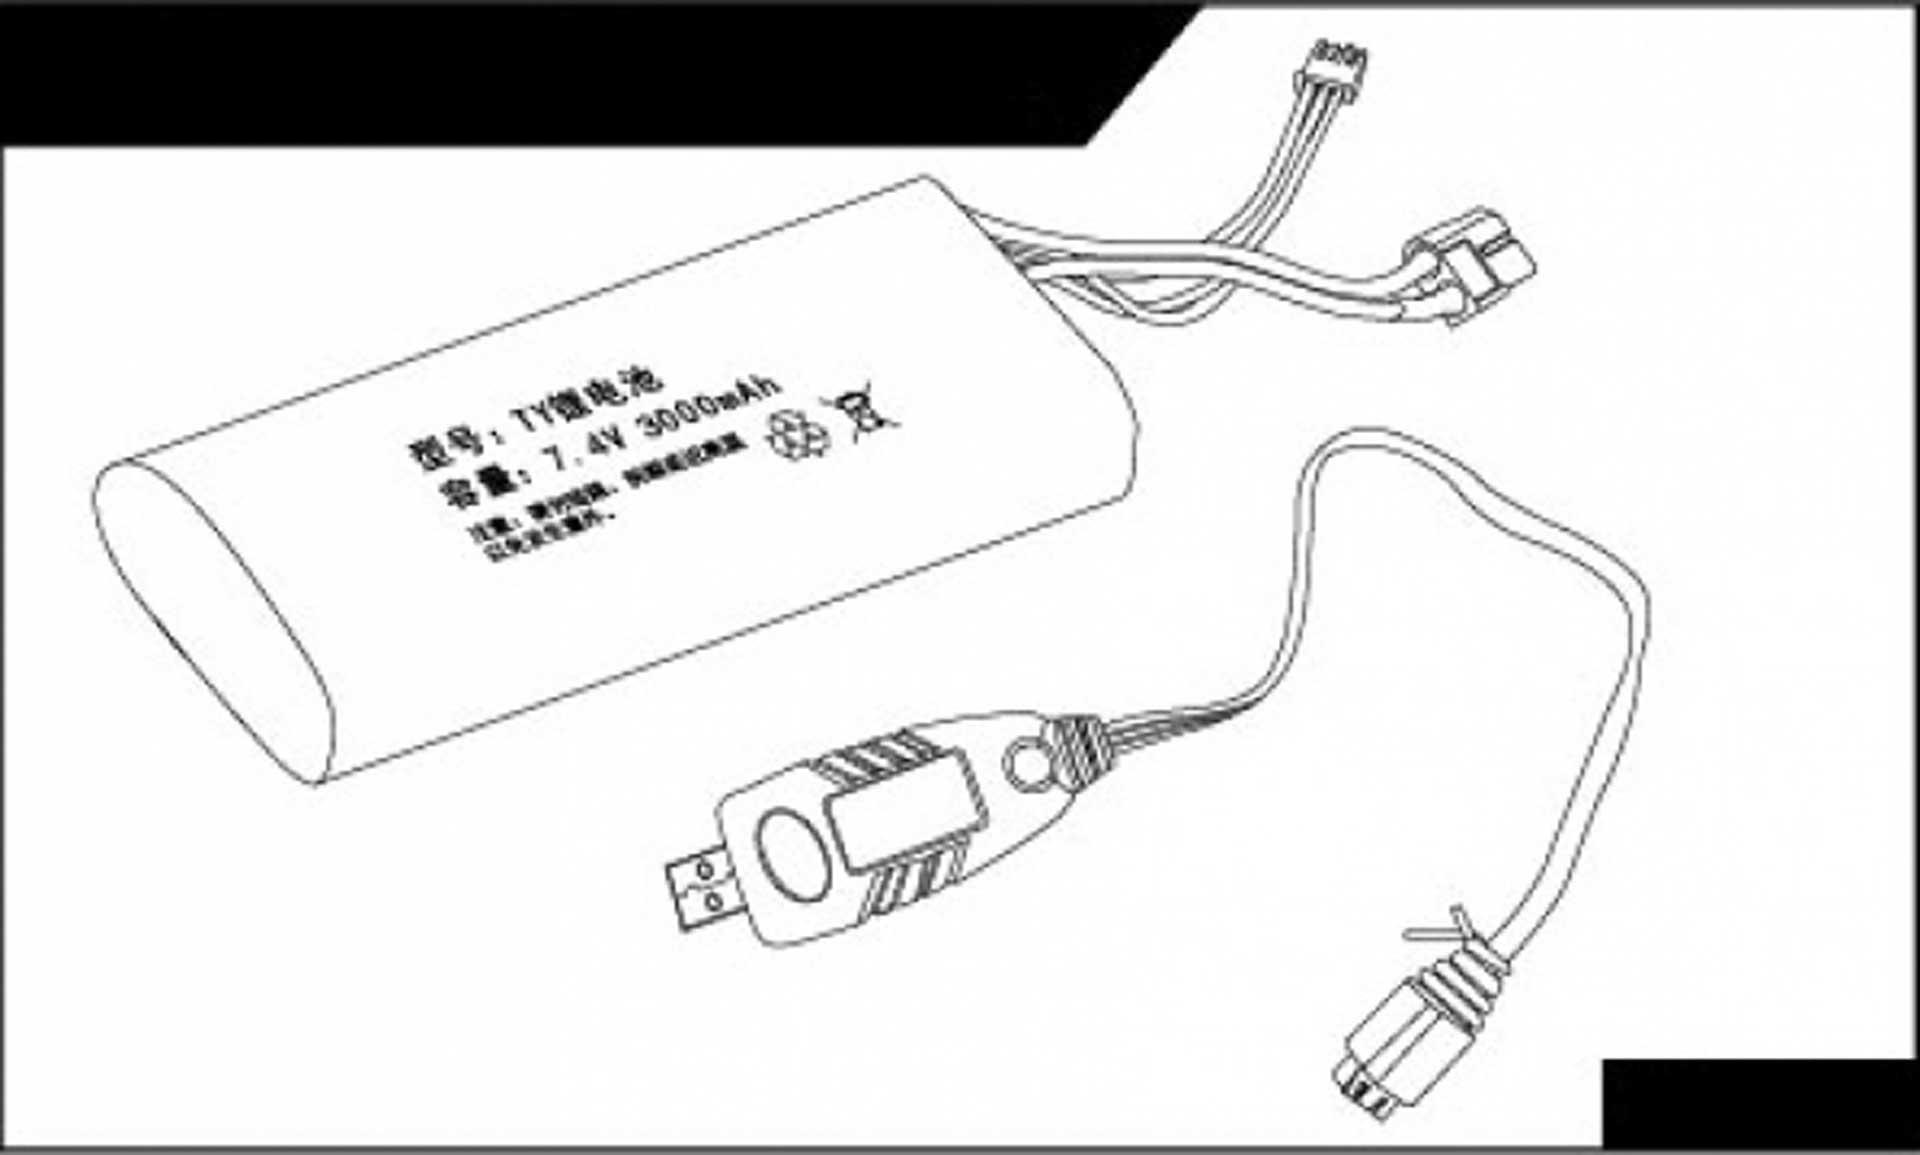 FM-ELECTRICS Ersatz Batterie für FM1680